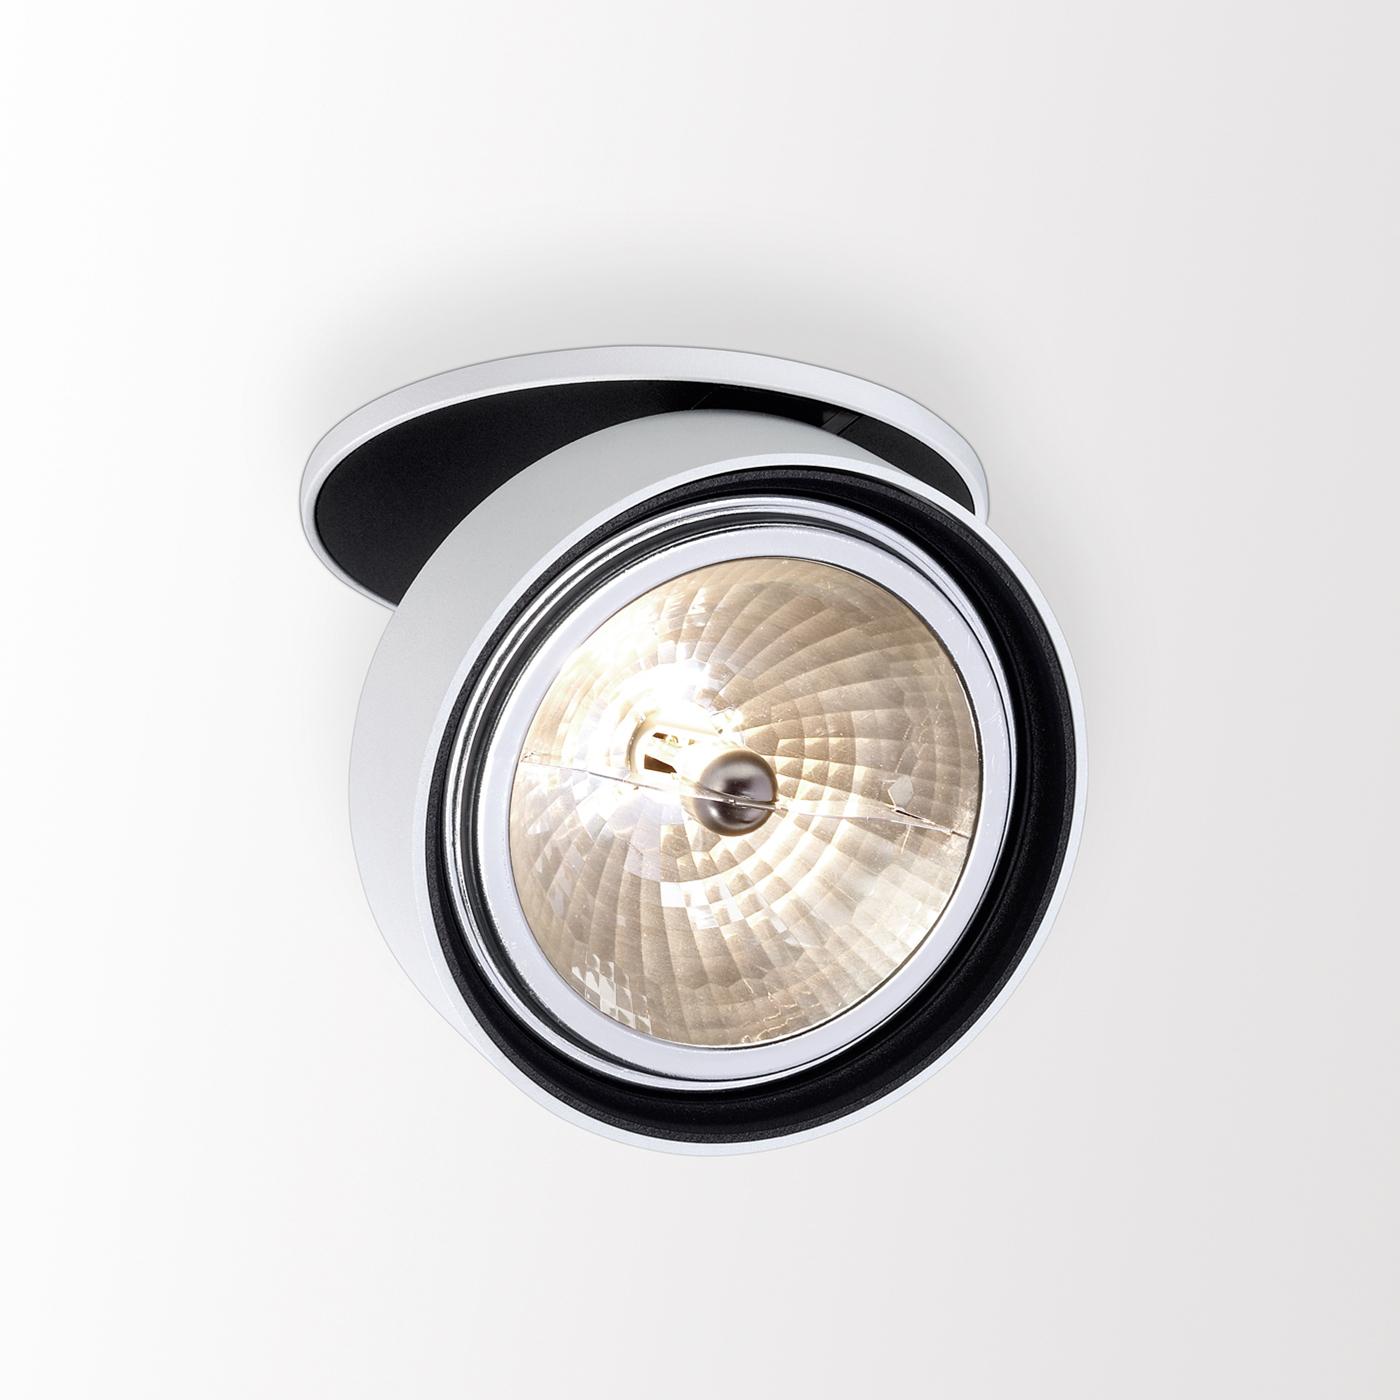 Delta Light You-Turn (111) - G53 Fassung